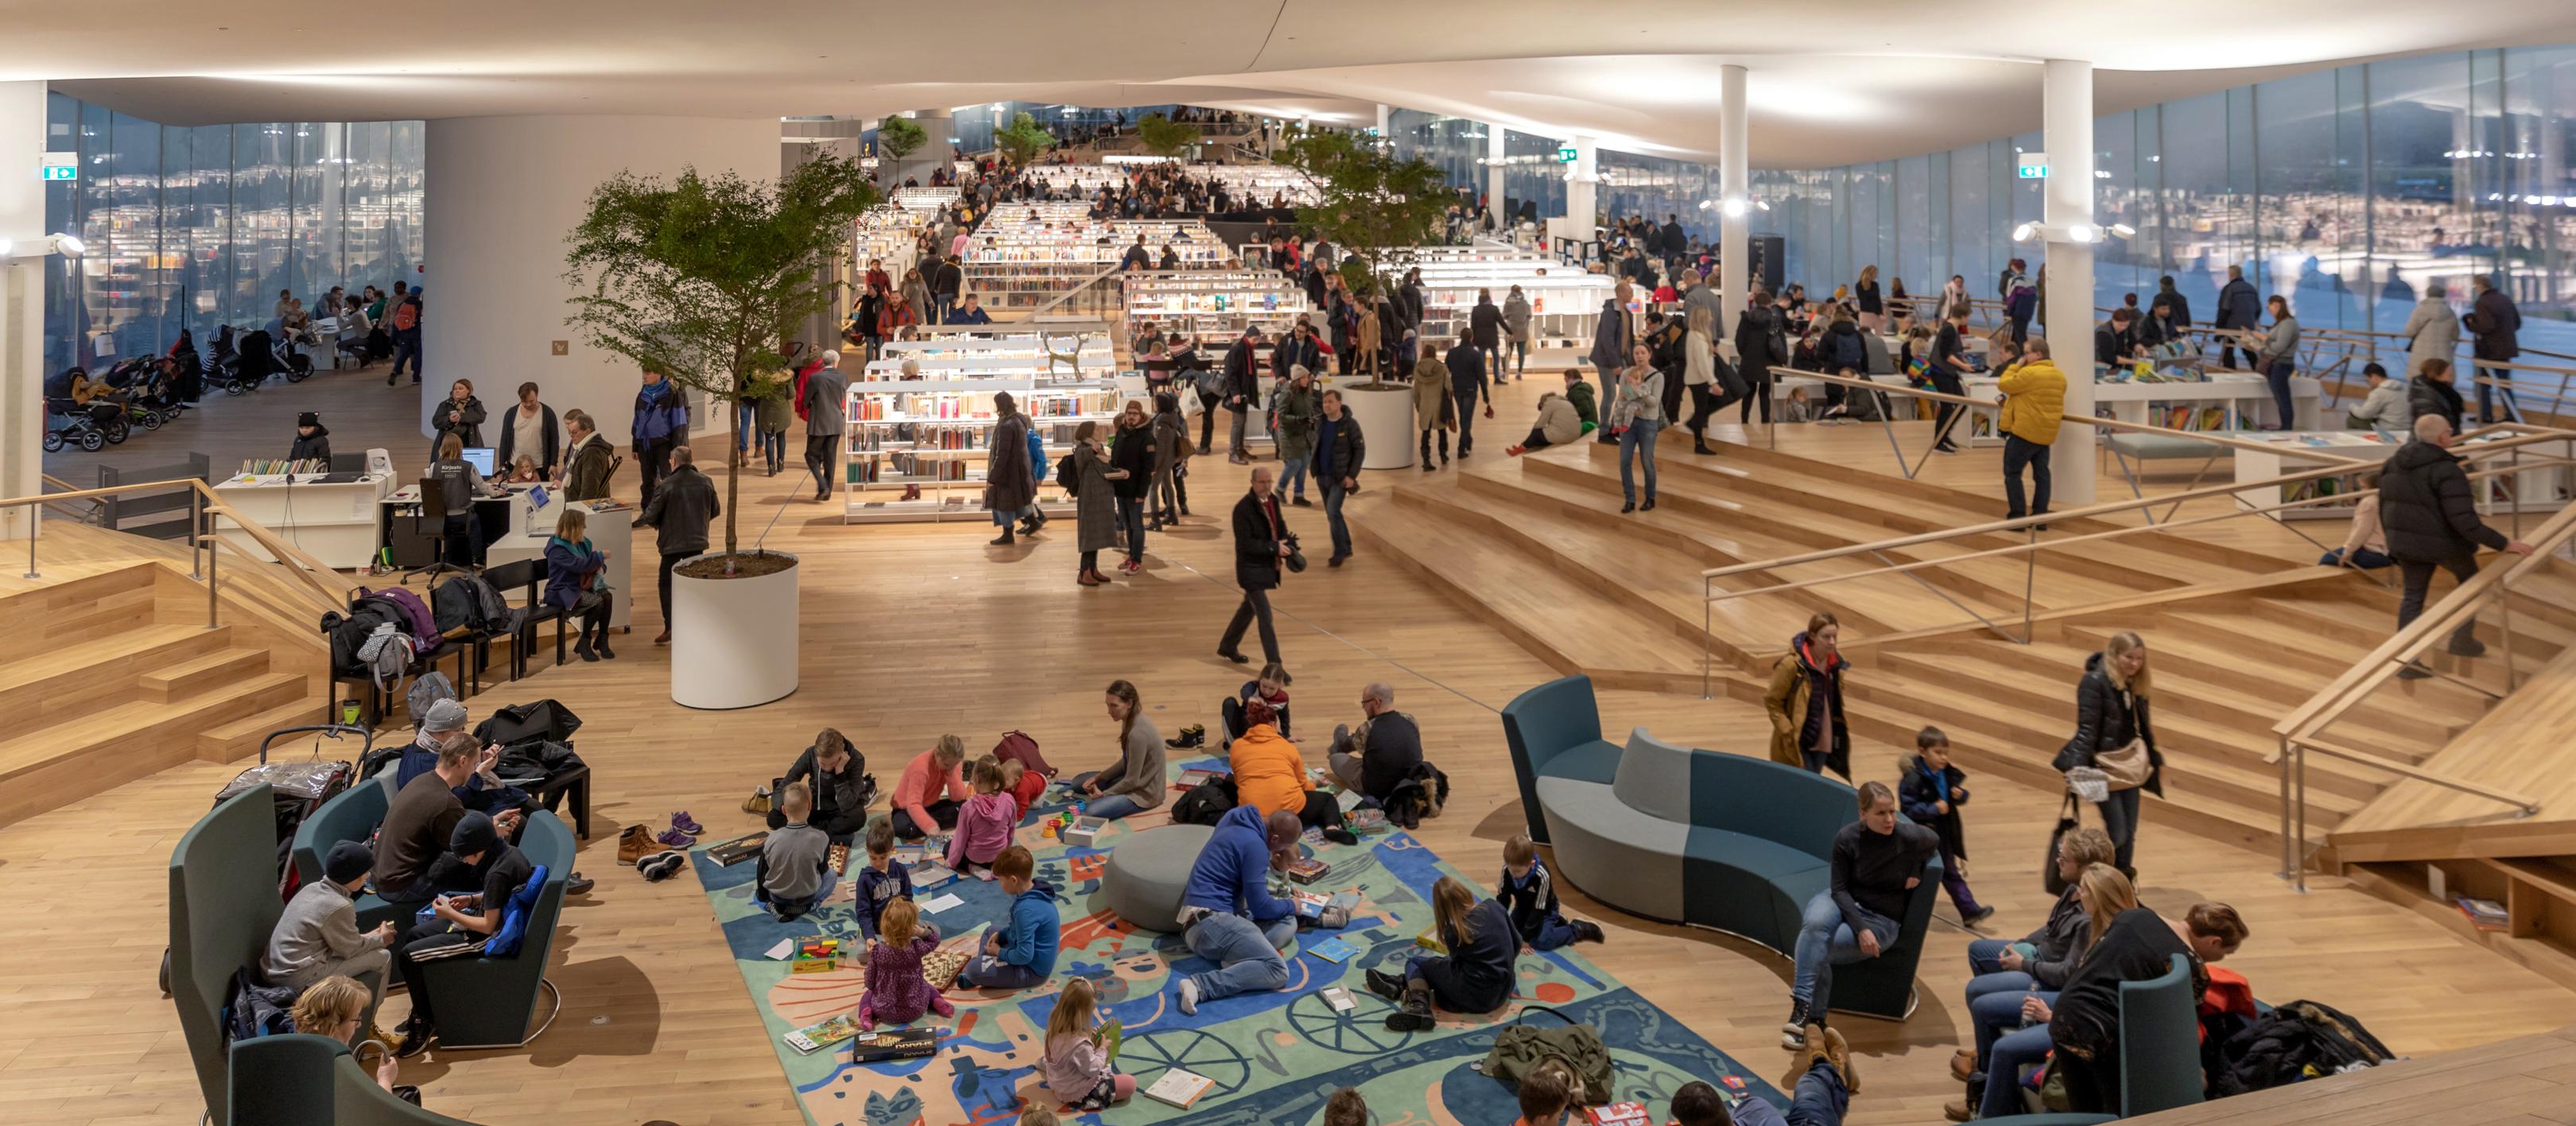 Finnland (10.-16.10.2021): Sozialer Wohlfahrtsstaat – starke Gesellschaft?